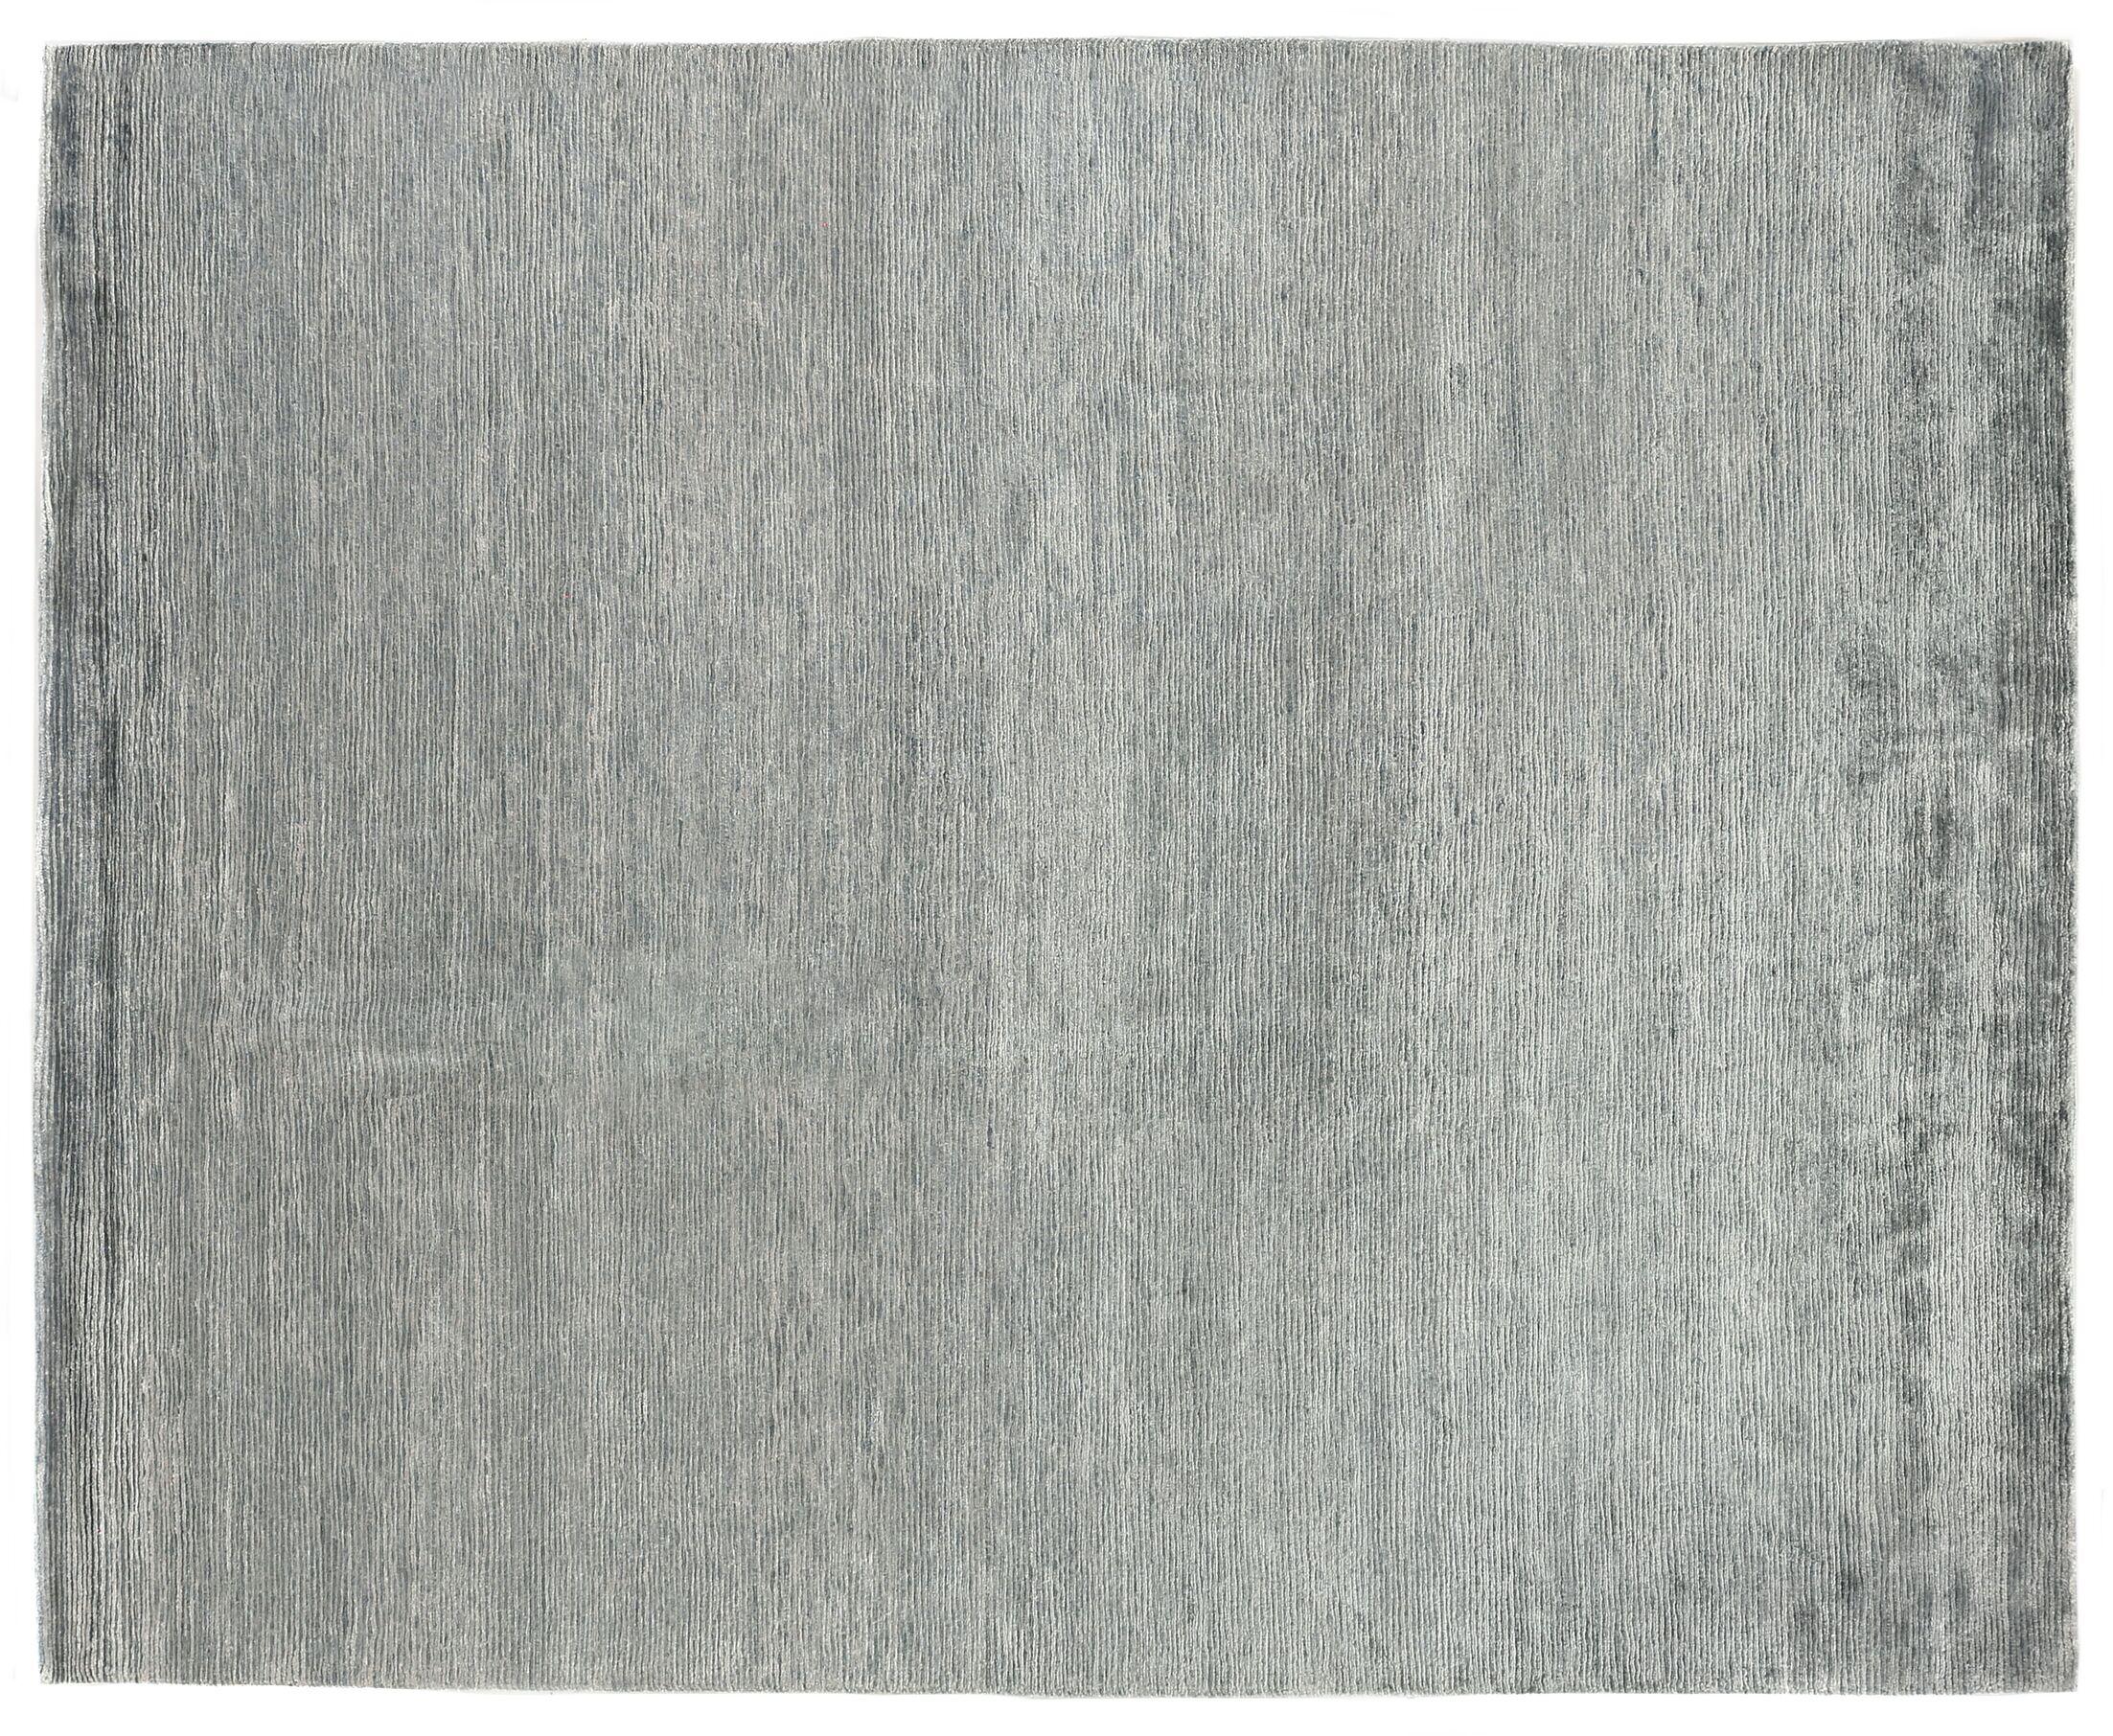 Crush Hand Knotted Silk Aqua/Dark Aqua Area Rug Rug Size: Rectangle 8' x 10'